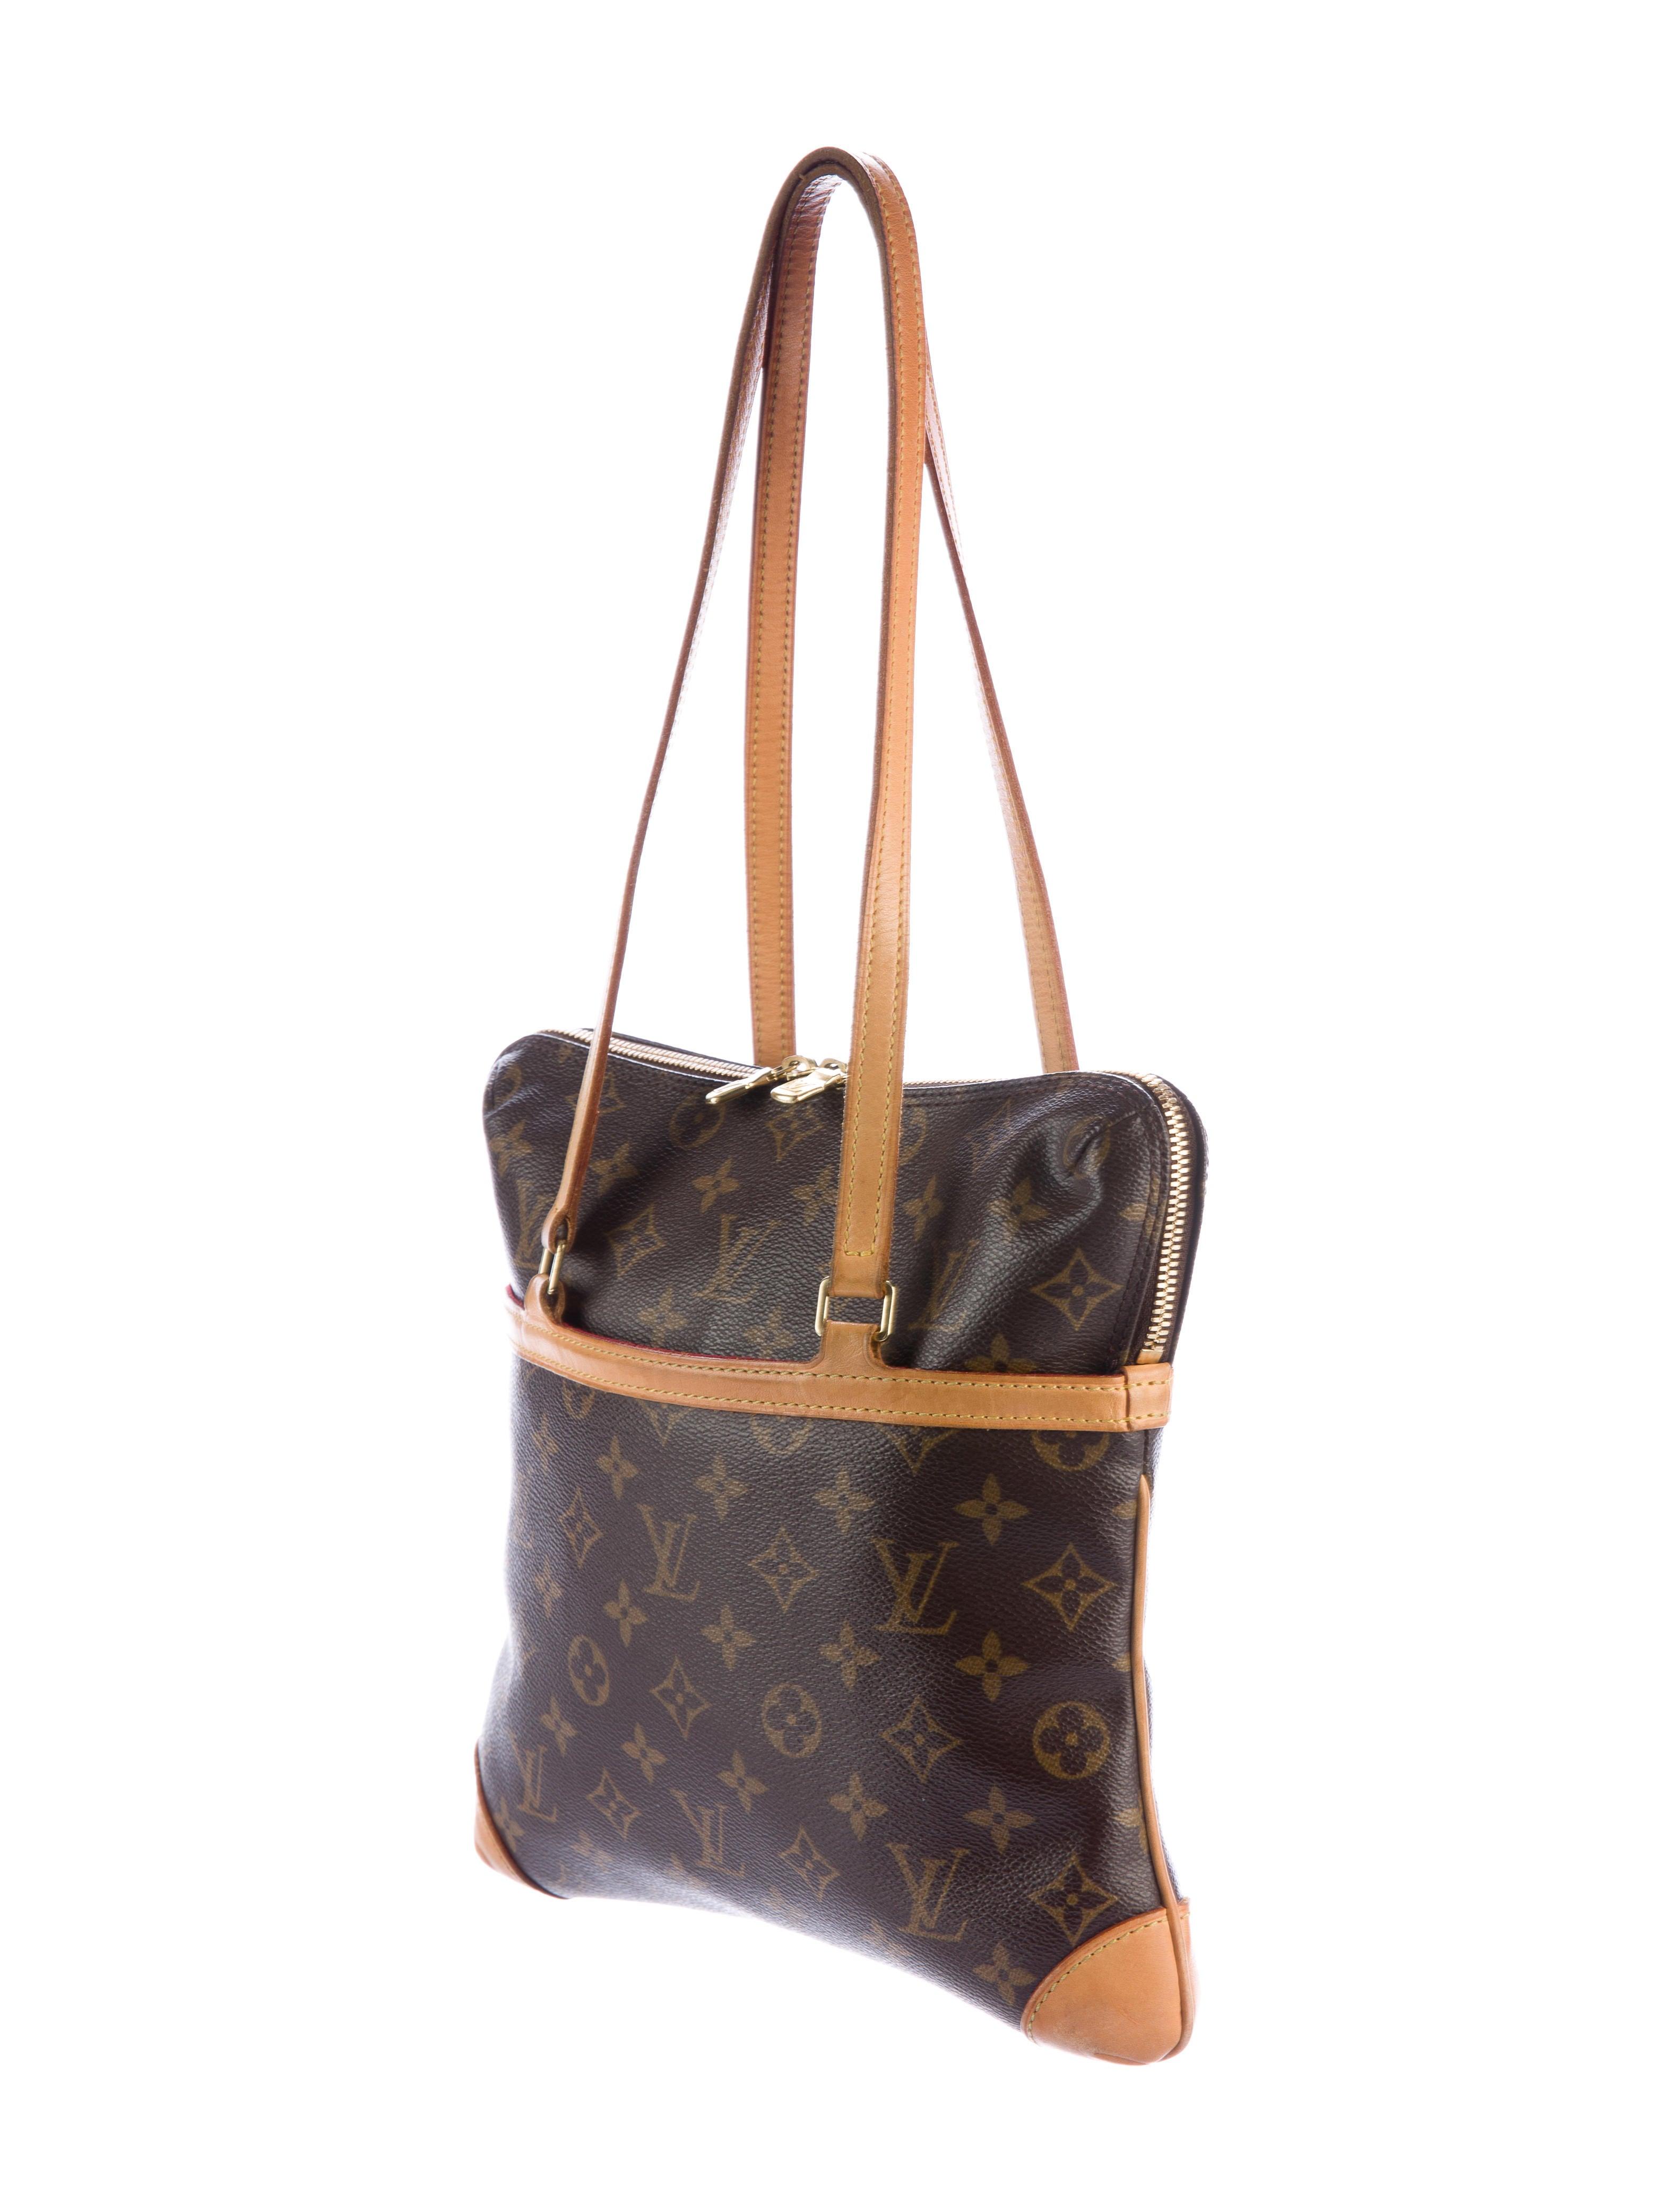 Sac Louis Vuitton Matelassé : Louis vuitton sac coussin gm handbags lou the